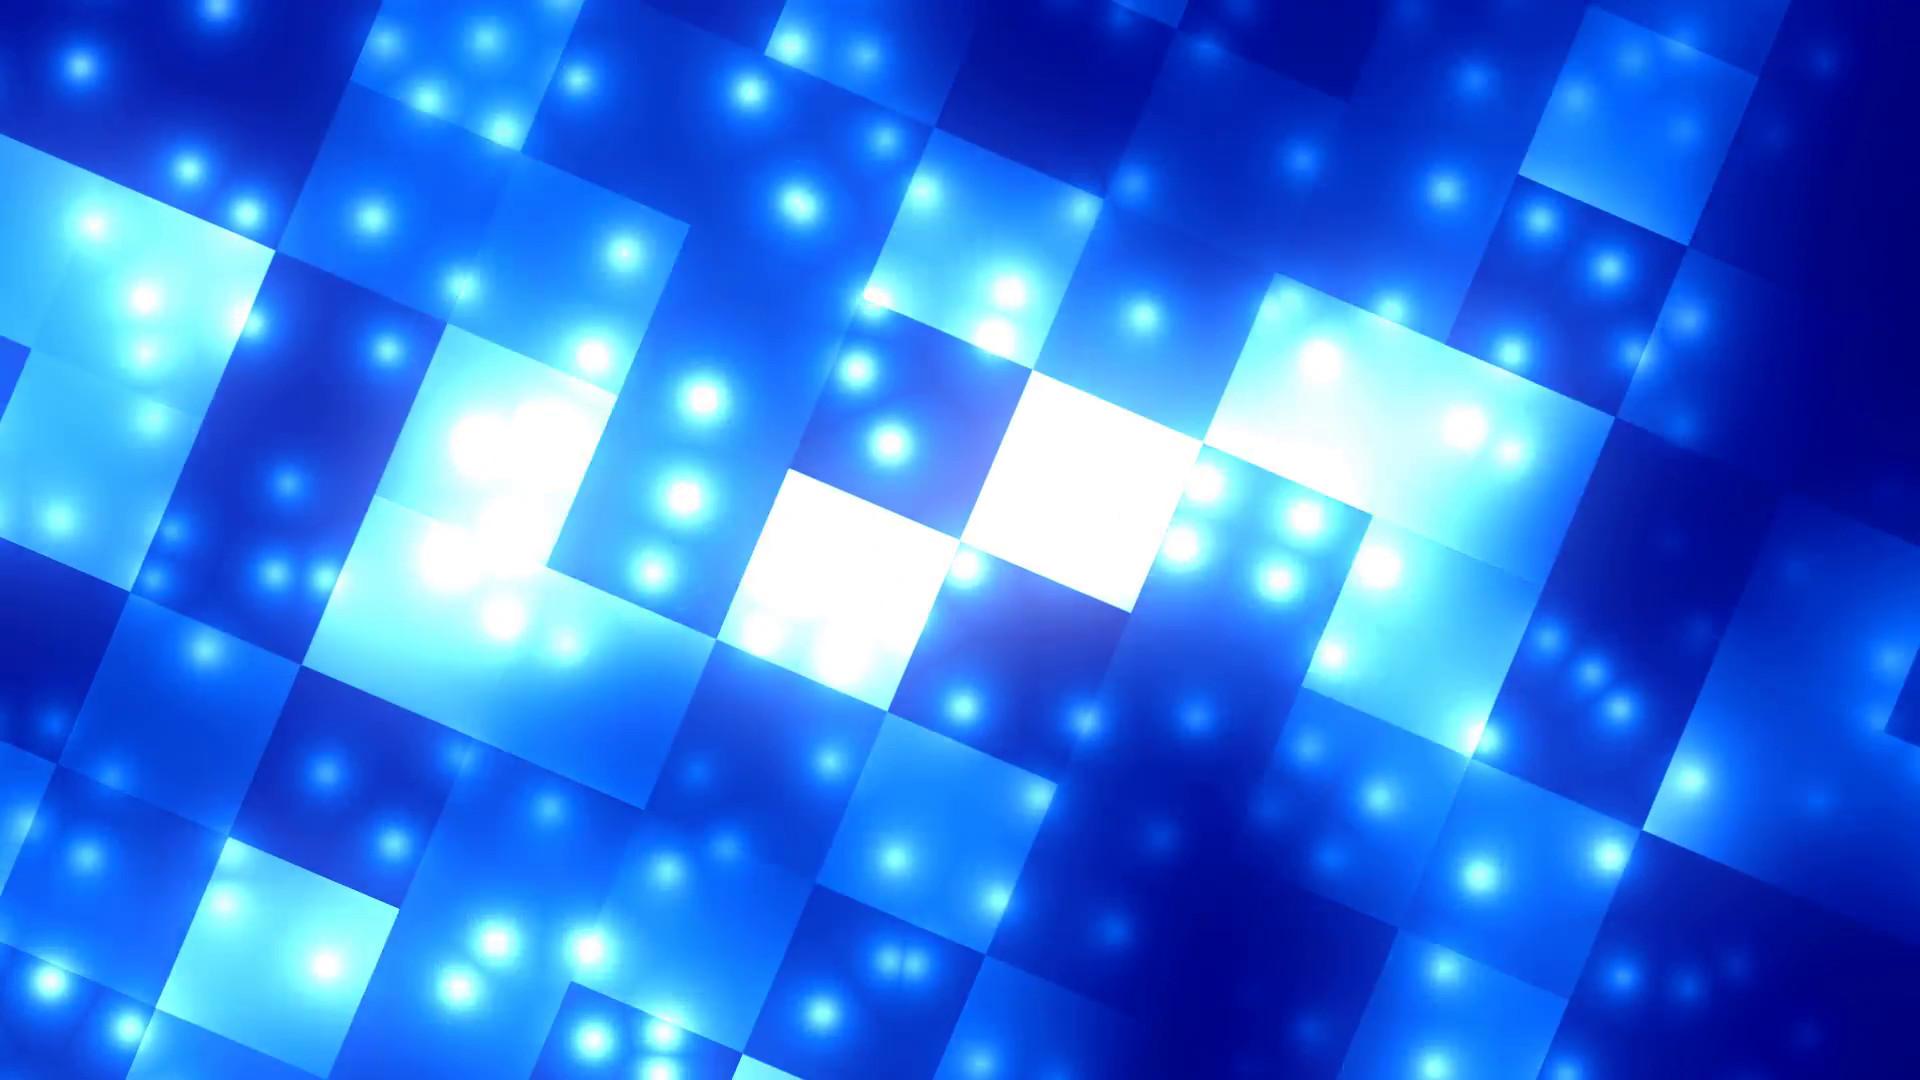 4k Orange Spiral Fire Light Dance Vj 2160p Background: Dance Background Images (59+ Images